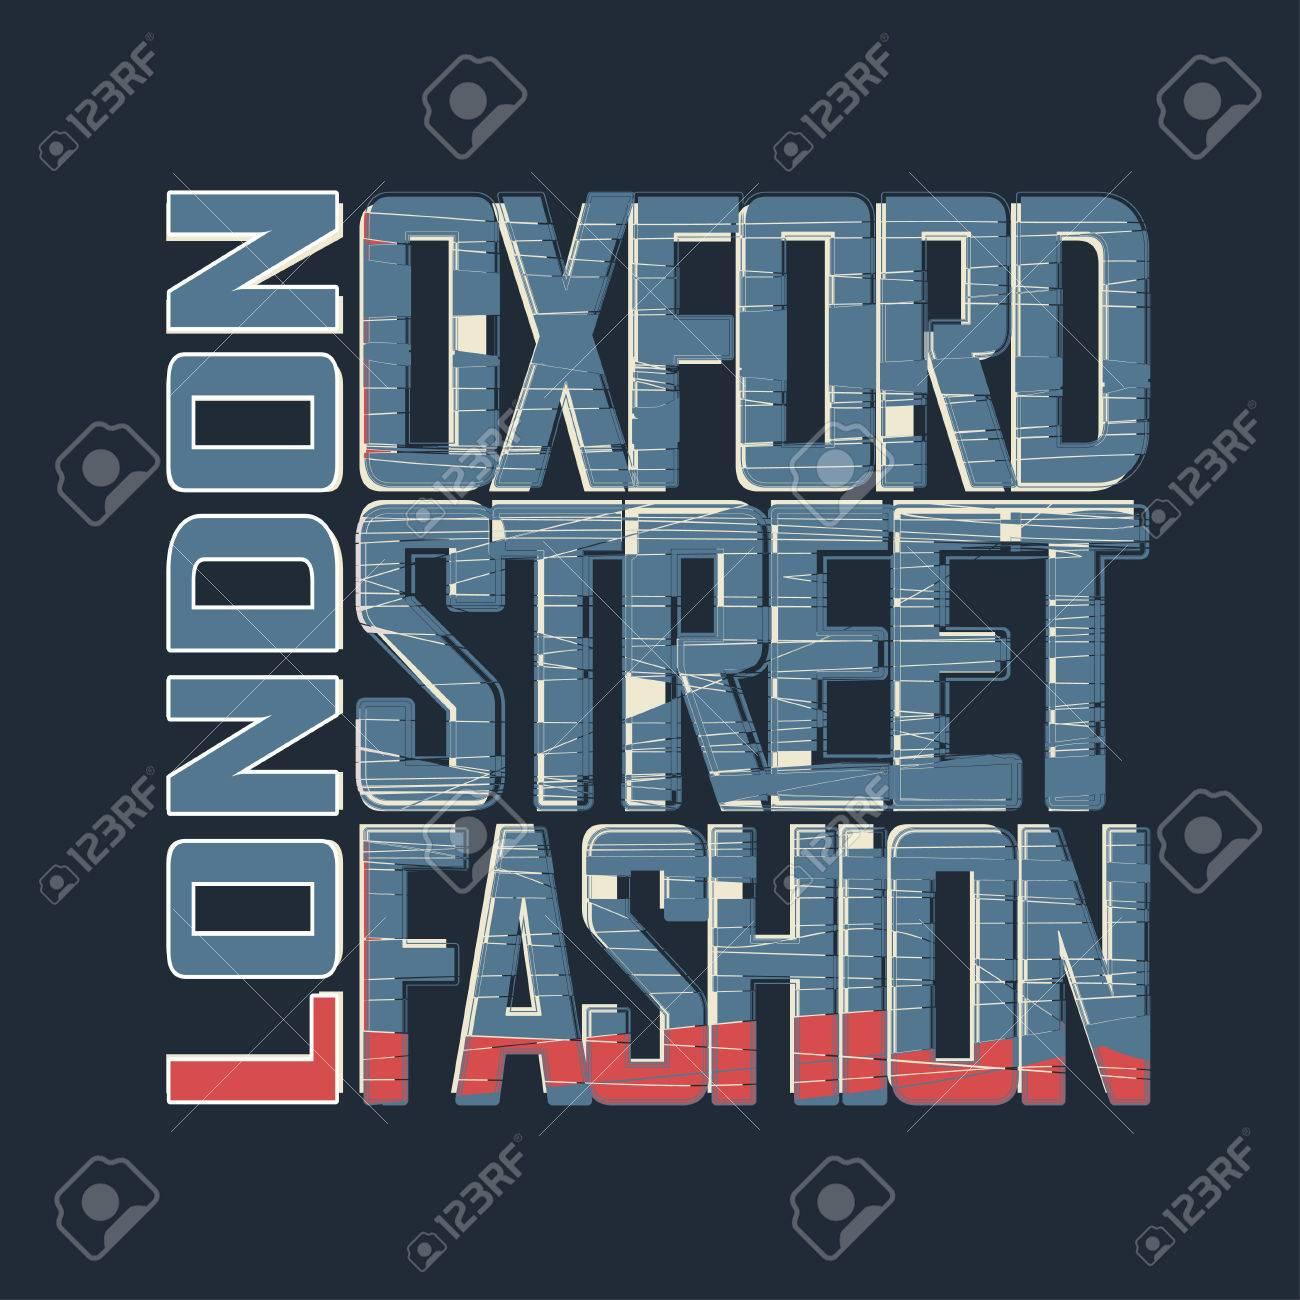 Shirt design london - London Typography Graphics T Shirt Design Oxford Street England Great Britain